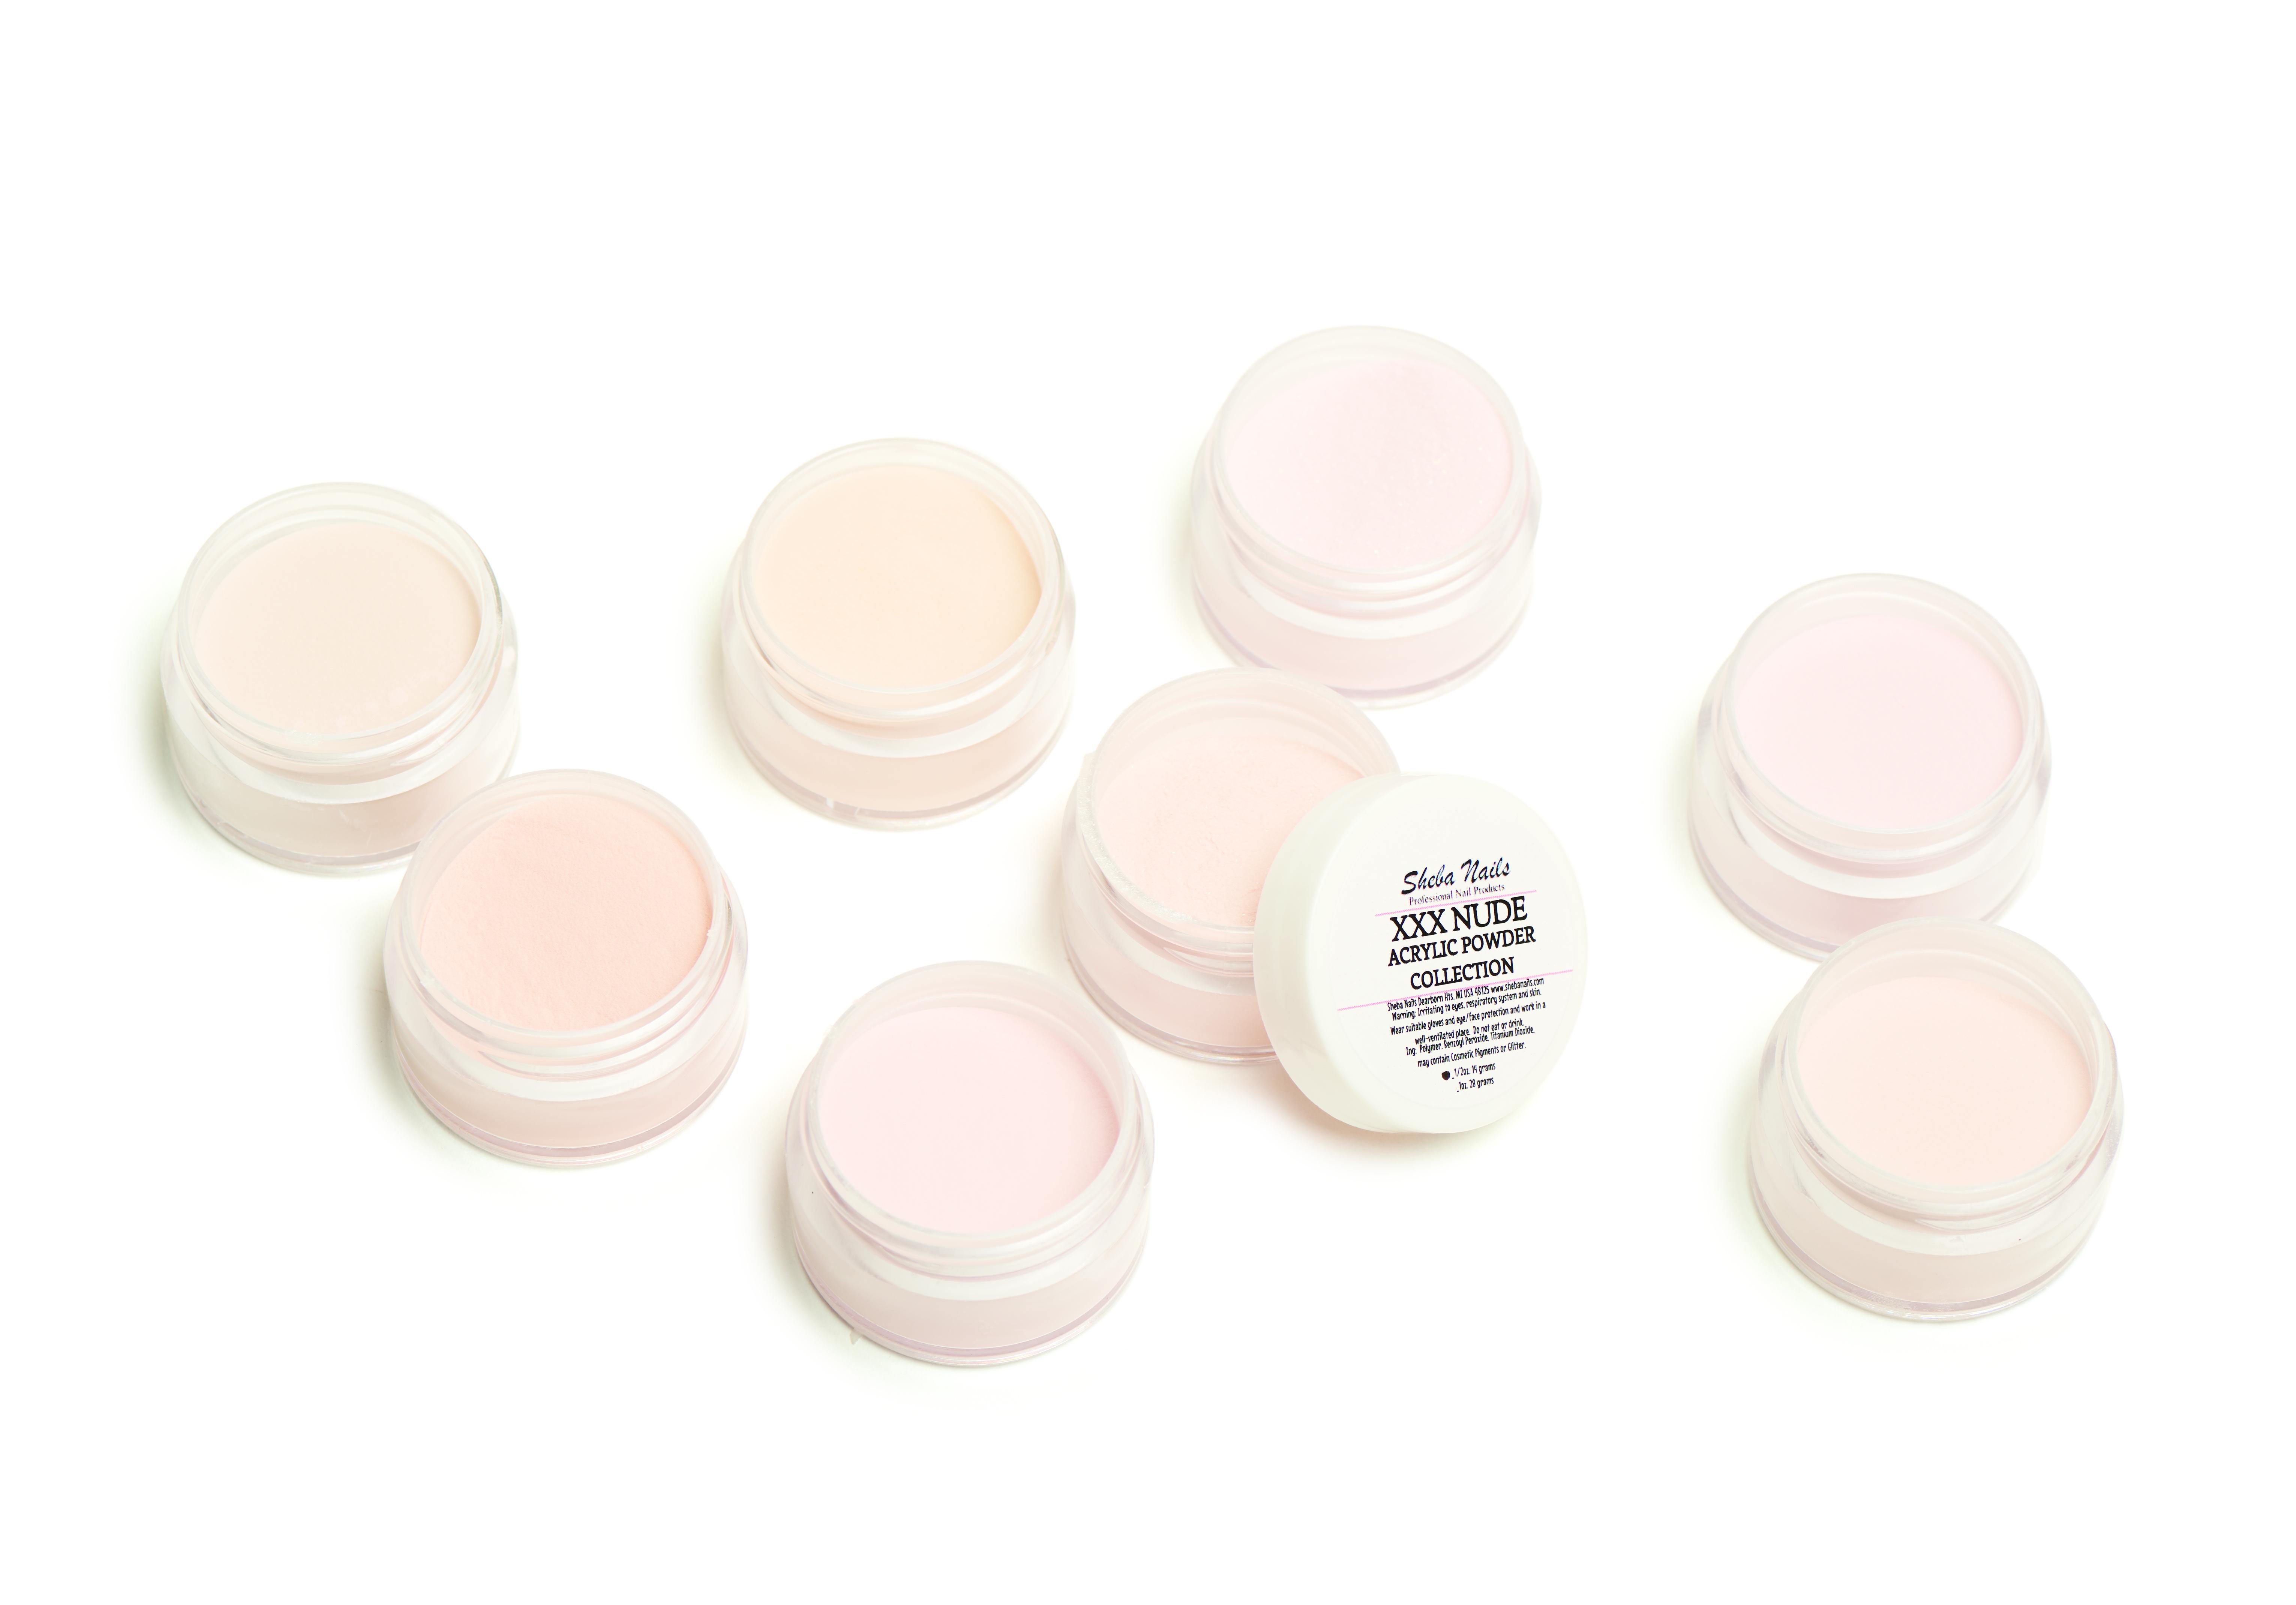 Nude Acrylic Powder Collection